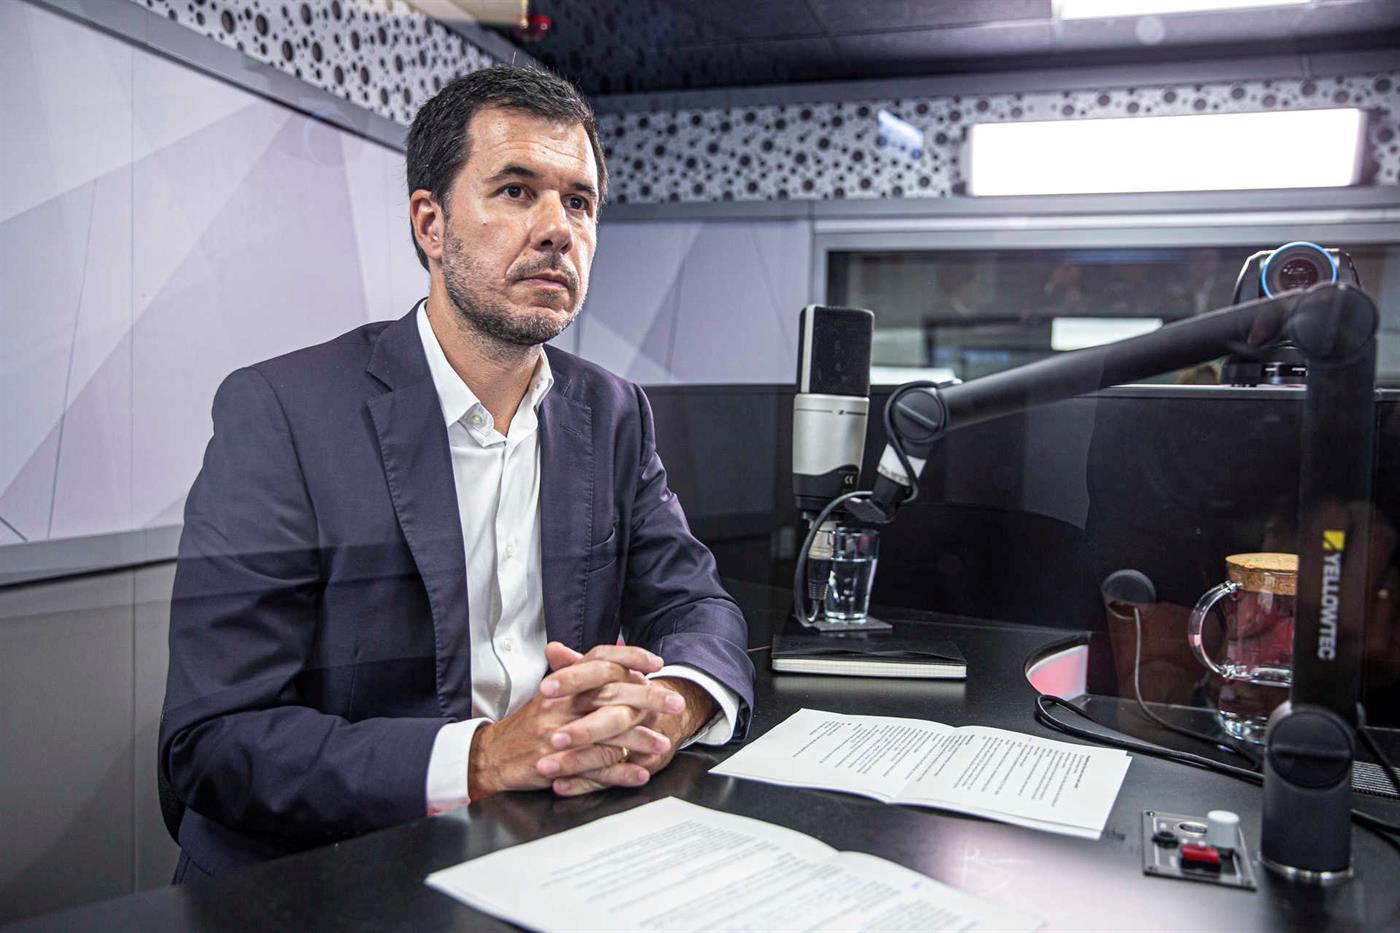 Pedro Capitao, Director of Hotel Management at Sonae Capital at TSF Studios in June 2021